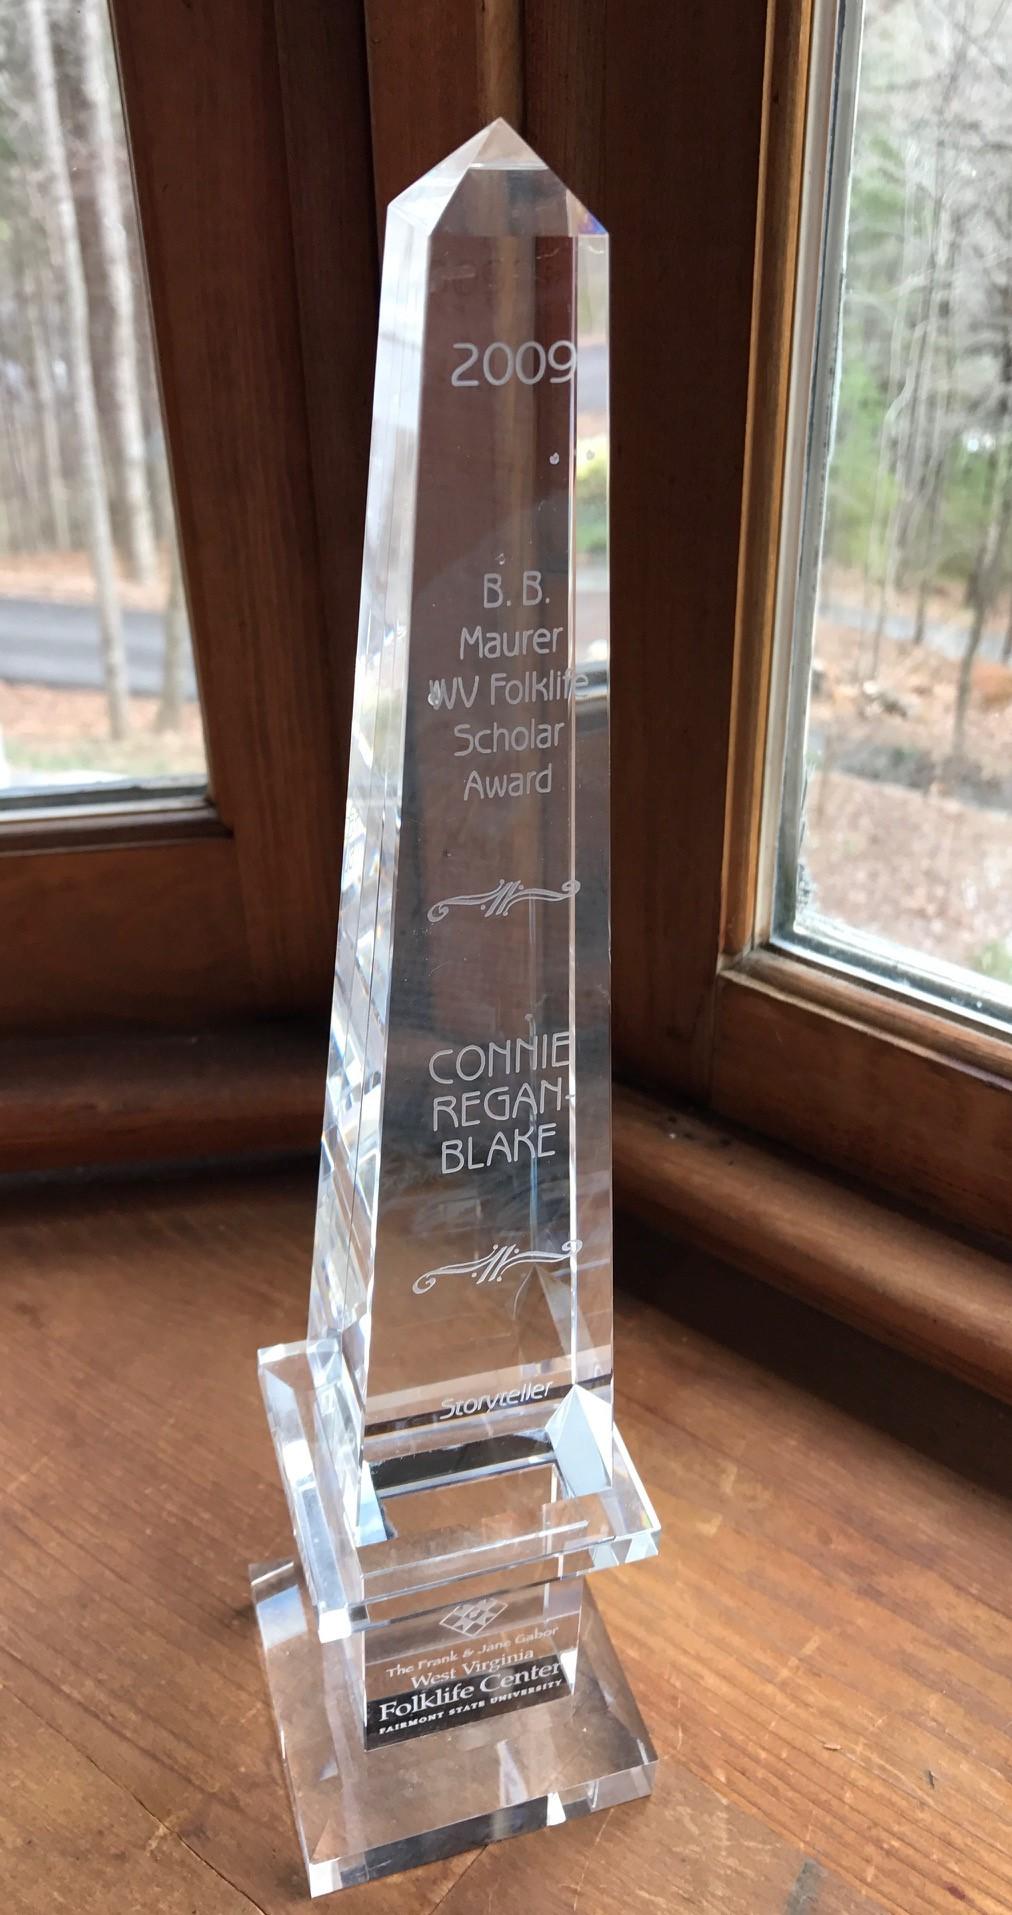 Awards, Folklife Scholar